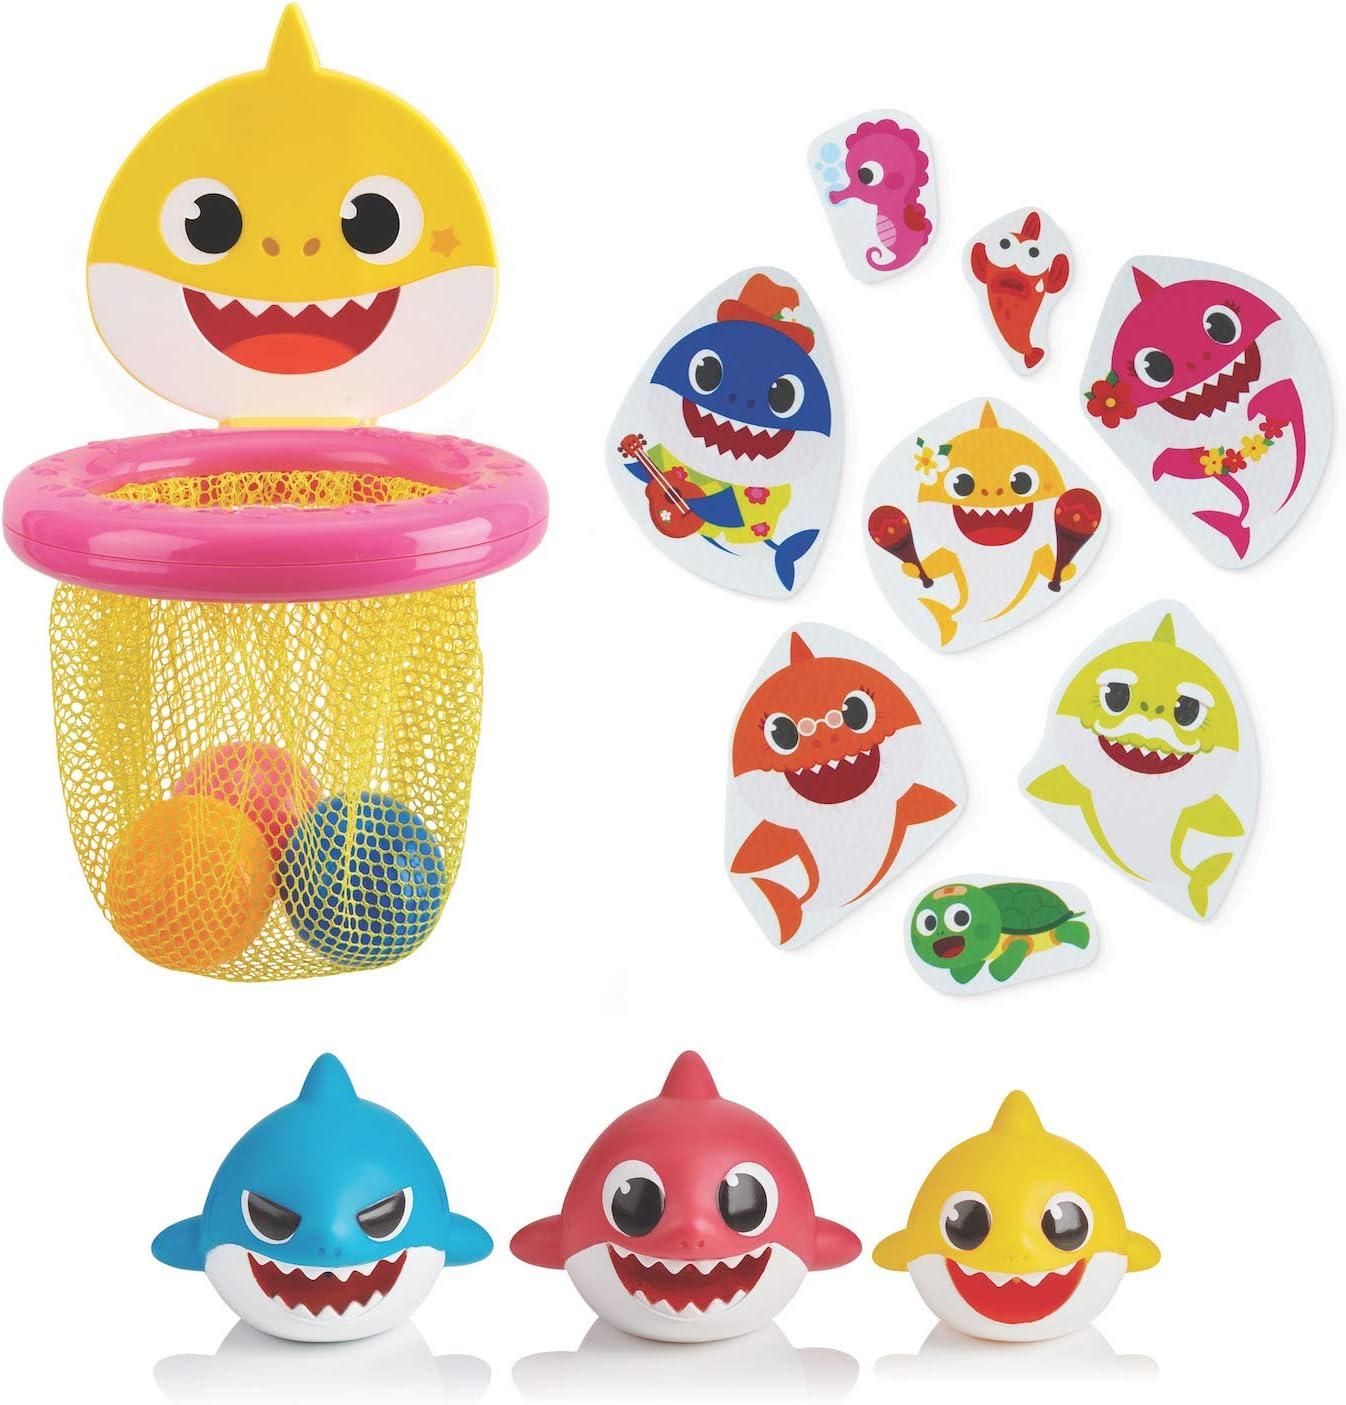 WowWee Pinkfong Baby Shark Official - Bath Toy Bundle (Amazon Exclusive)